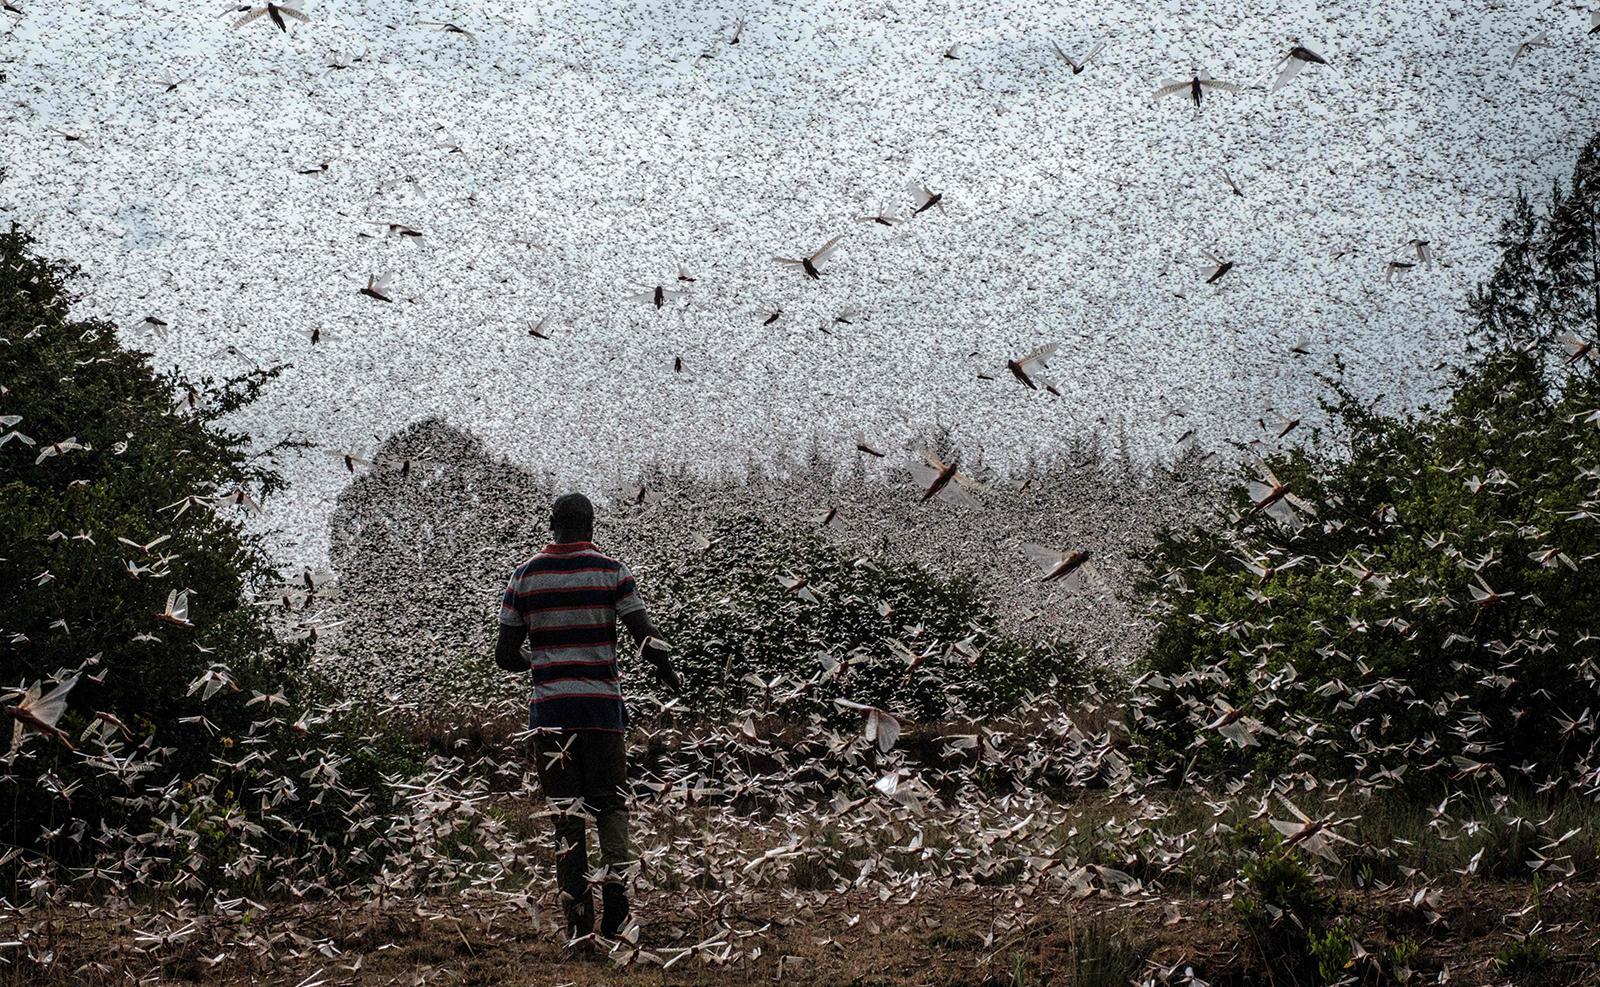 A picuture taken on February 9, 2021, shows a local farmer walking in a swarm of desert locust in Meru, Kenya. AFP